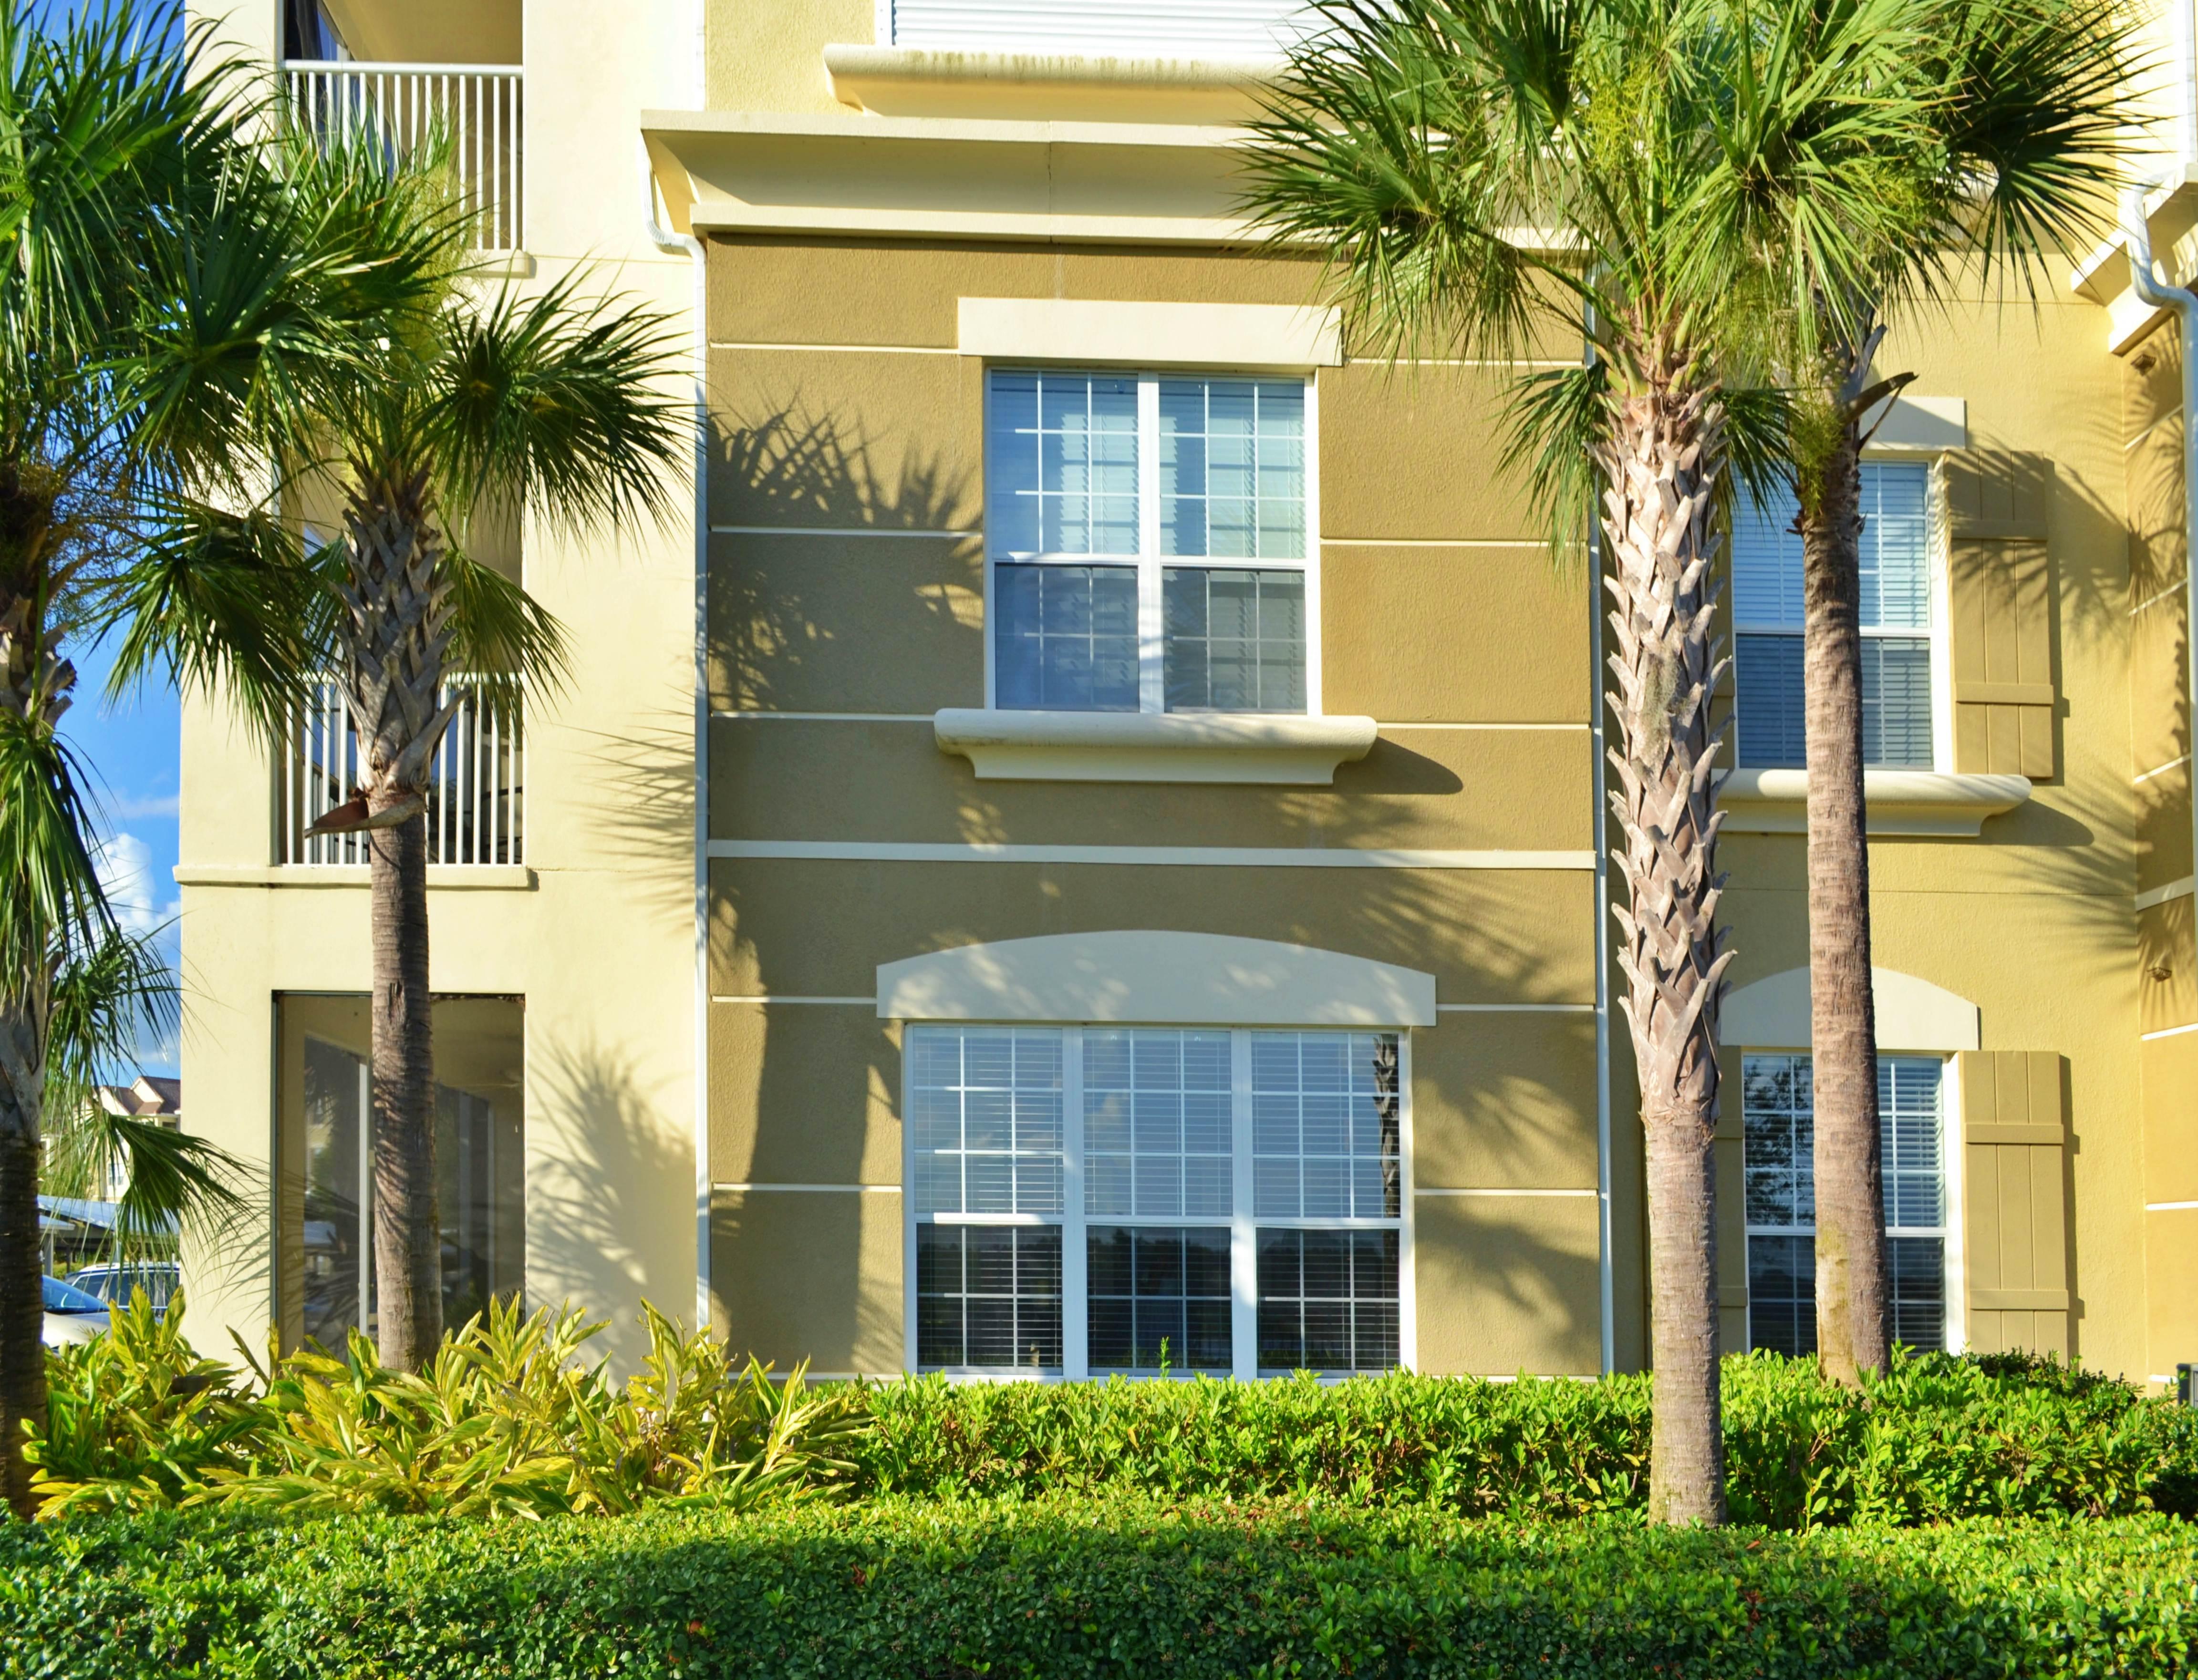 Home for sale: 3362 Robert Trent Jone Dr, Orlando, FL